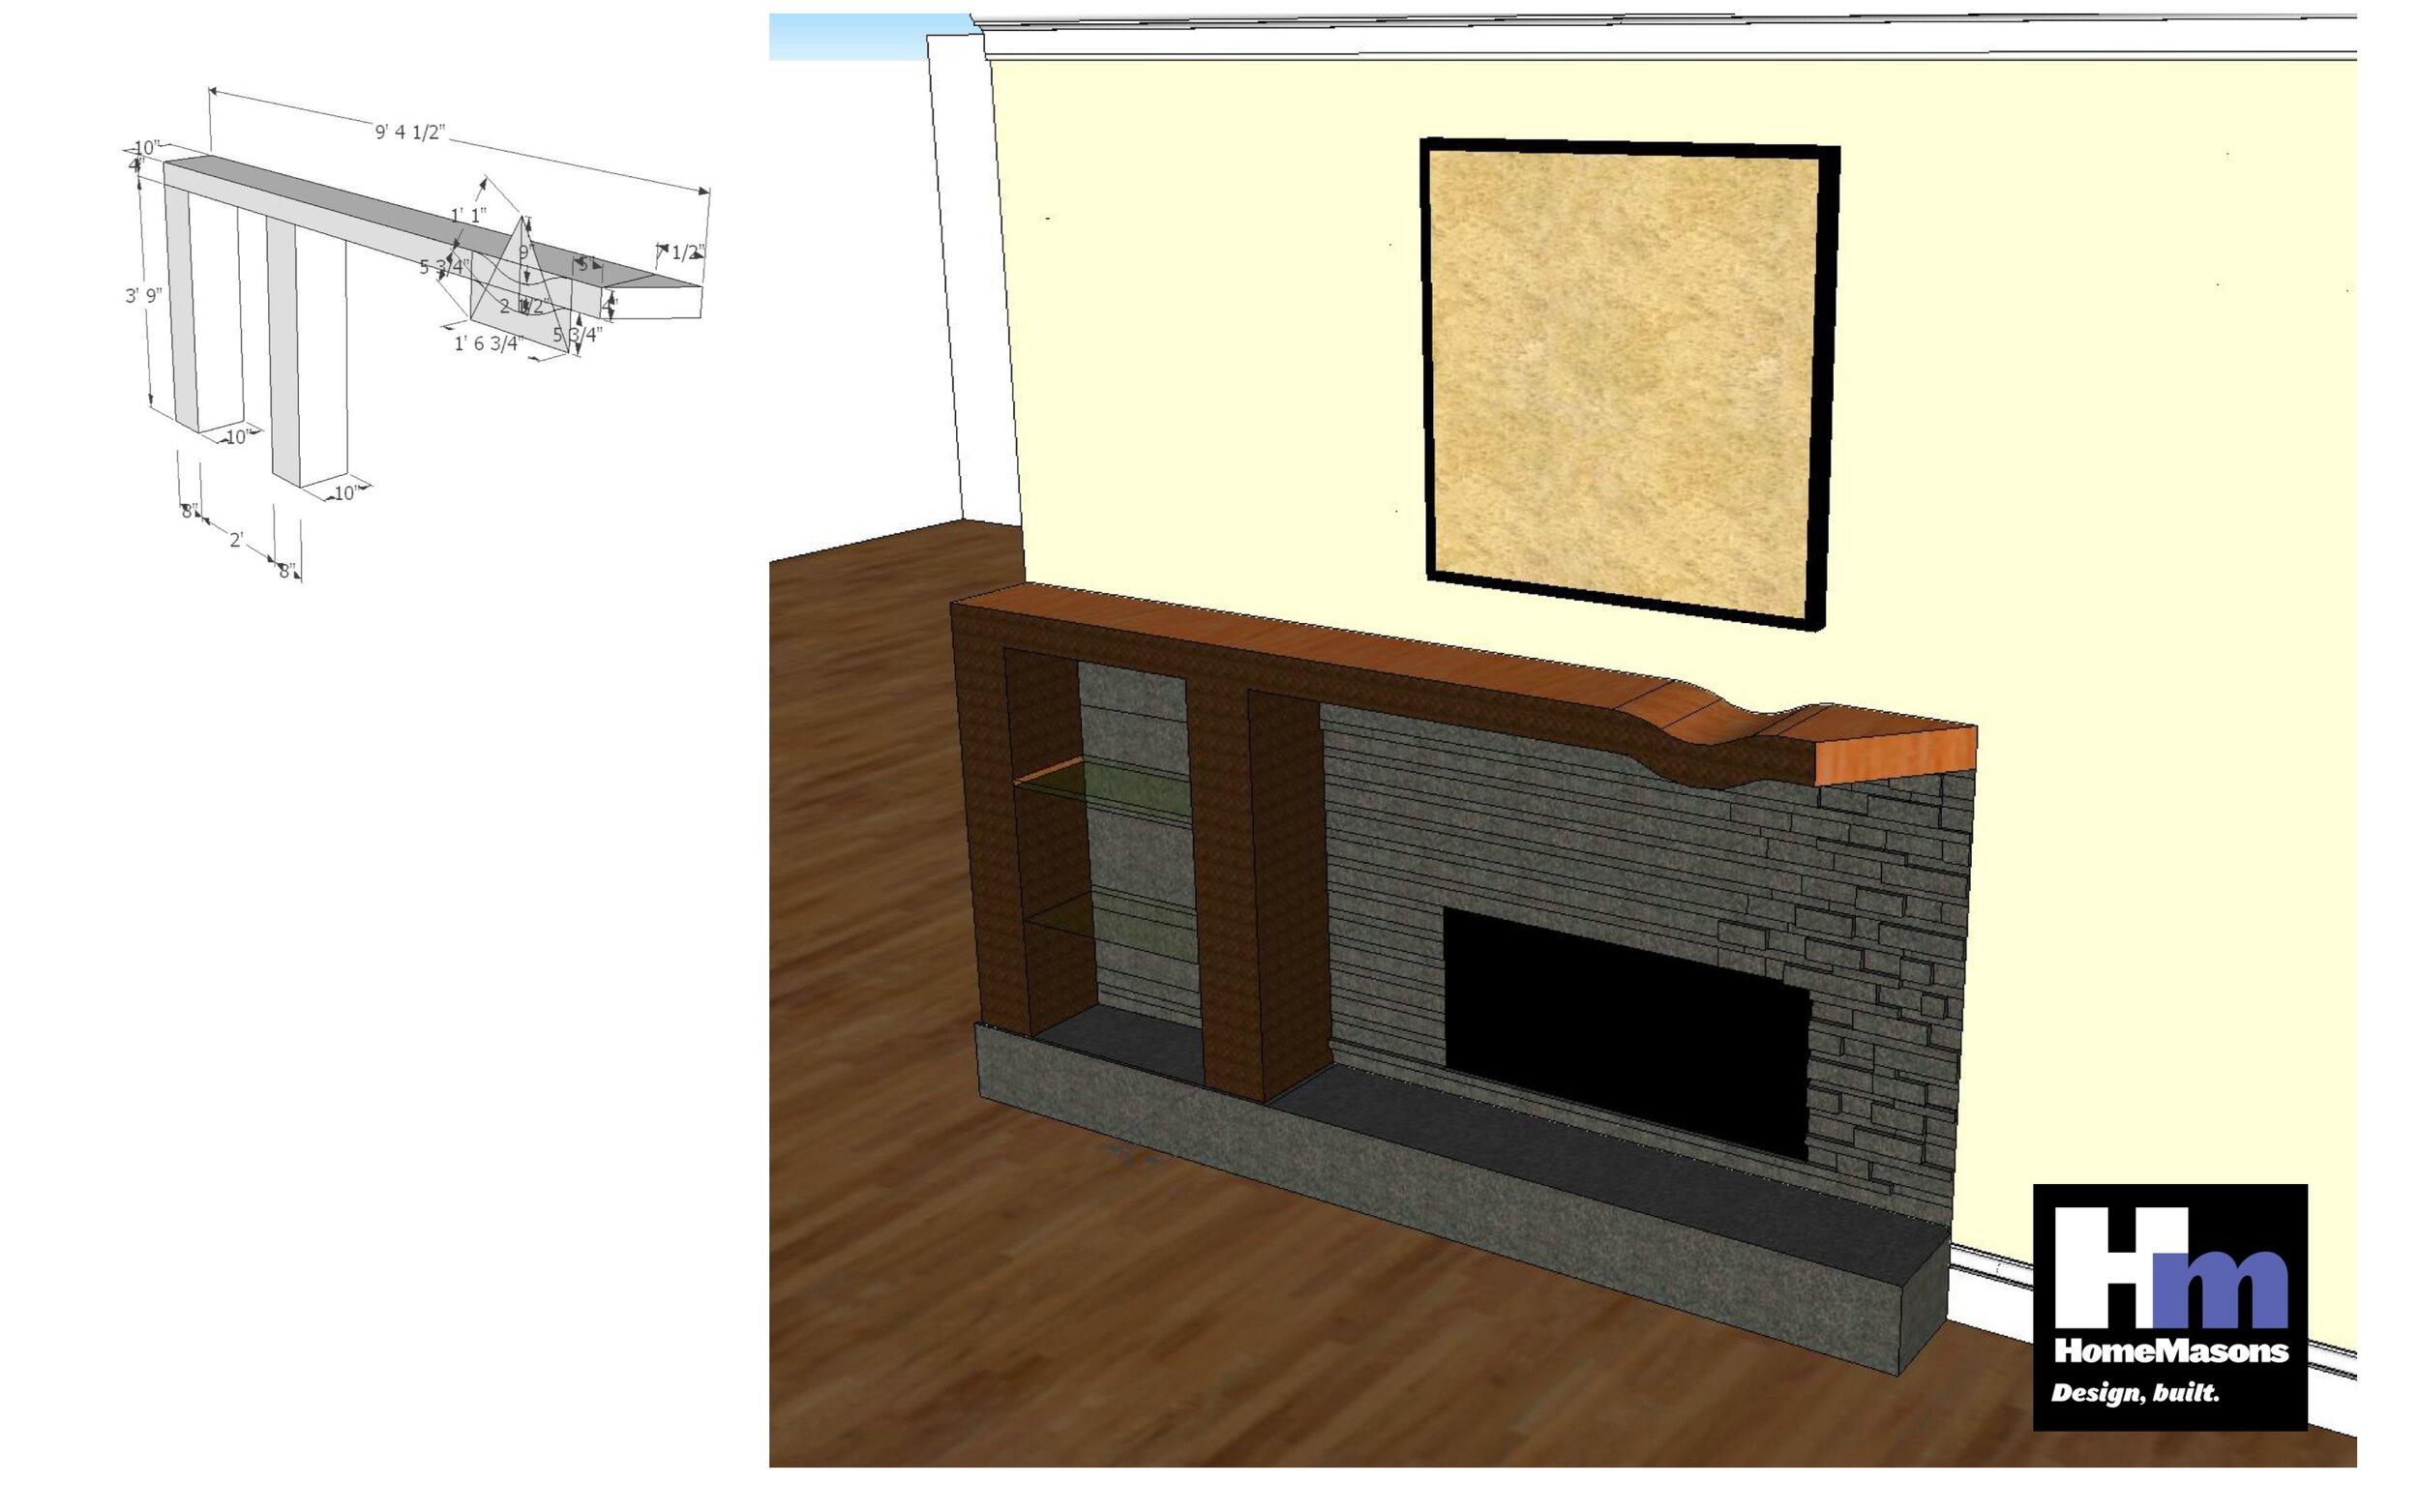 HomeMasons-3 (1).jpg